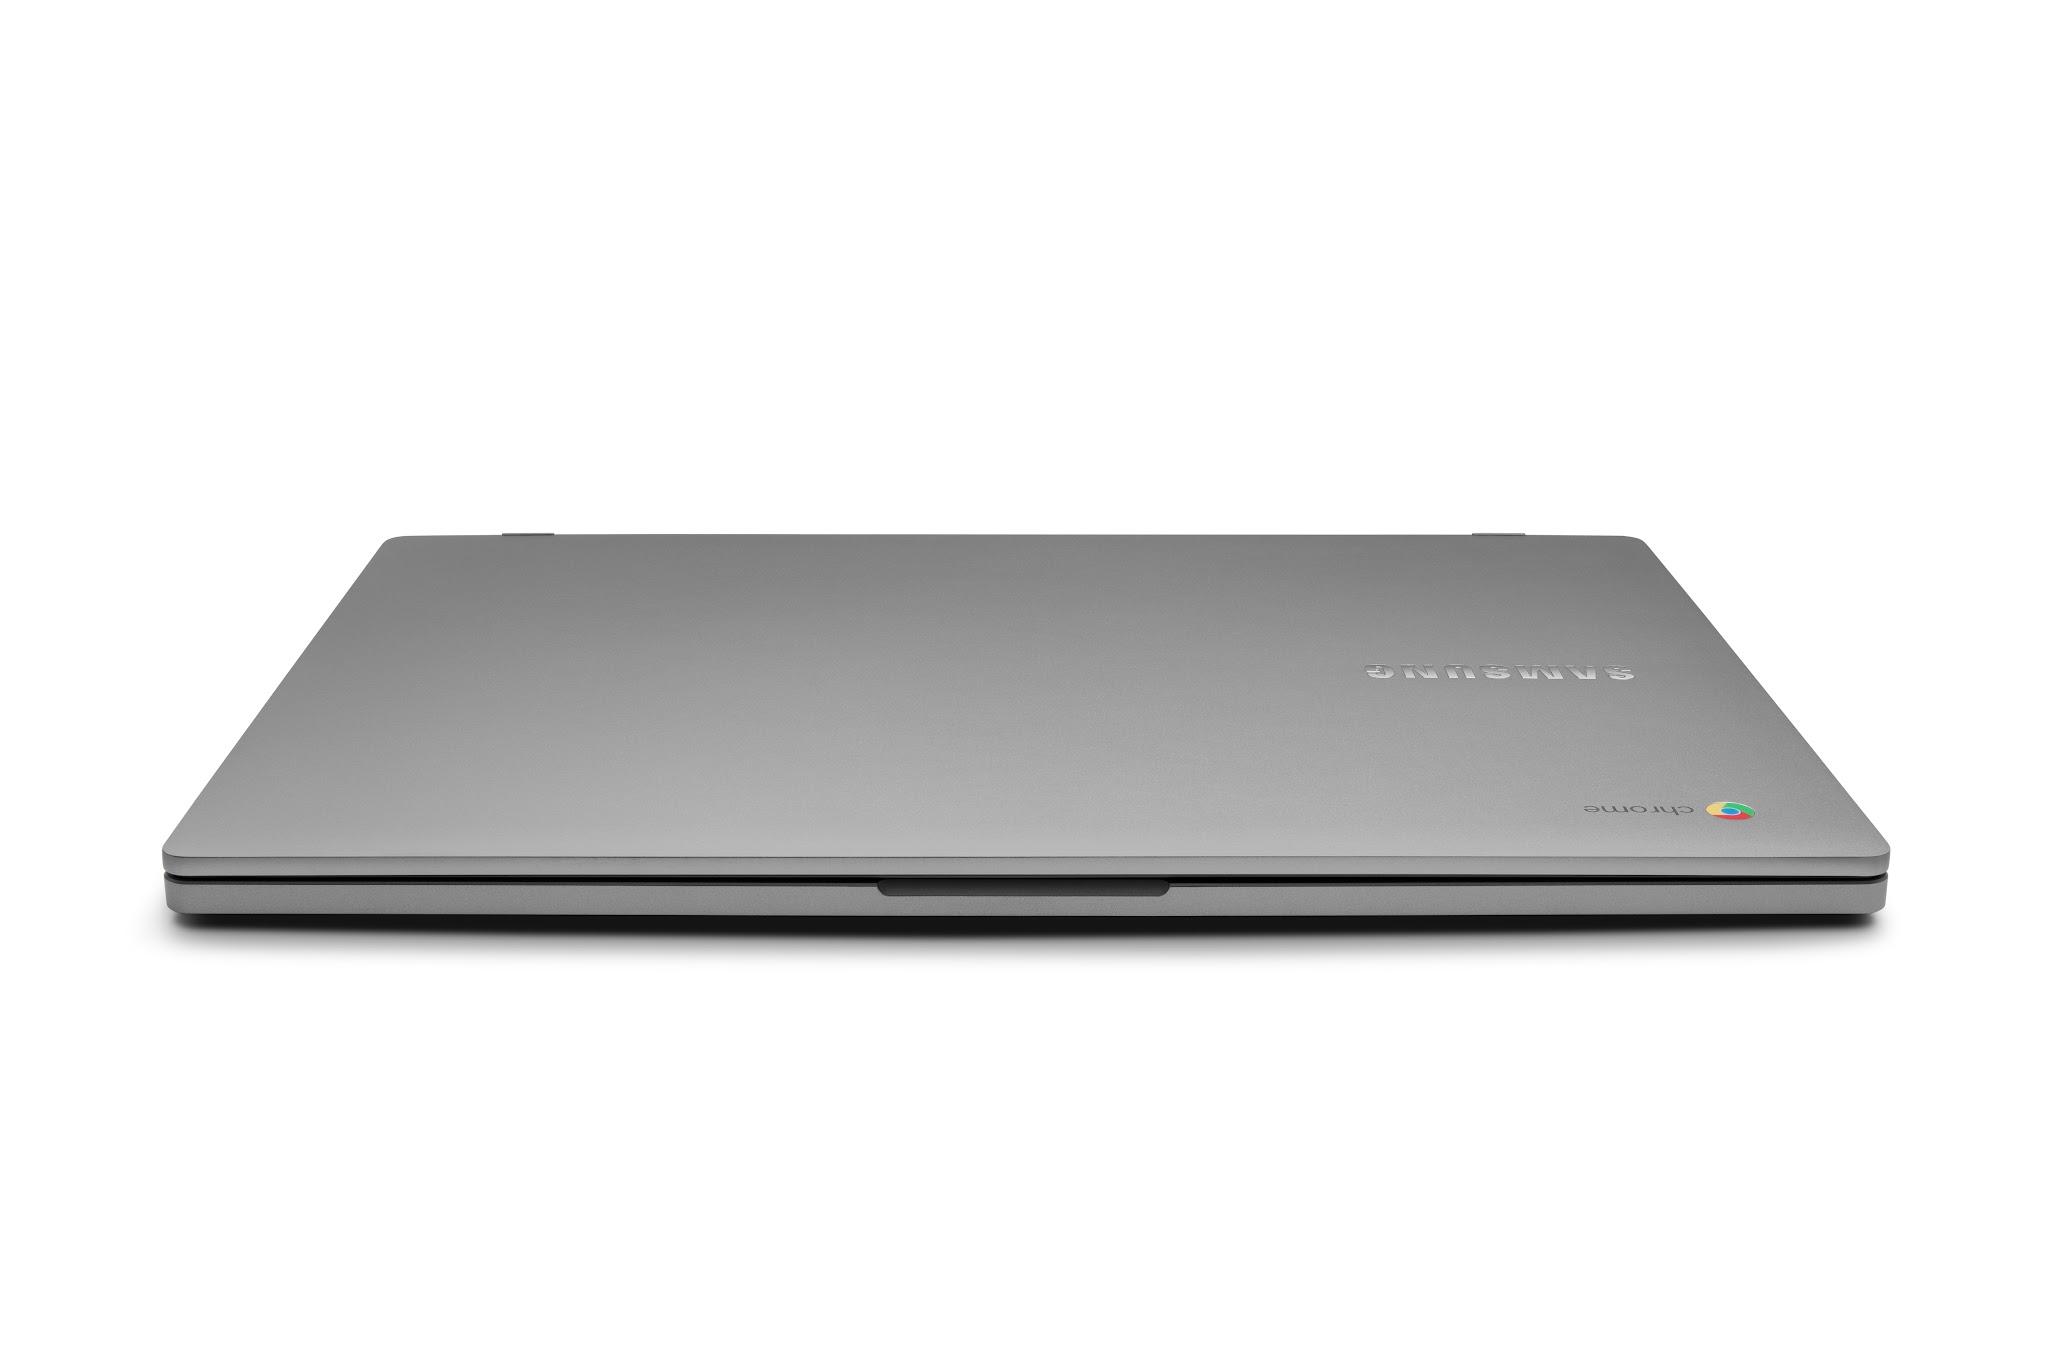 Samsung Chromebook 4+ - photo 11